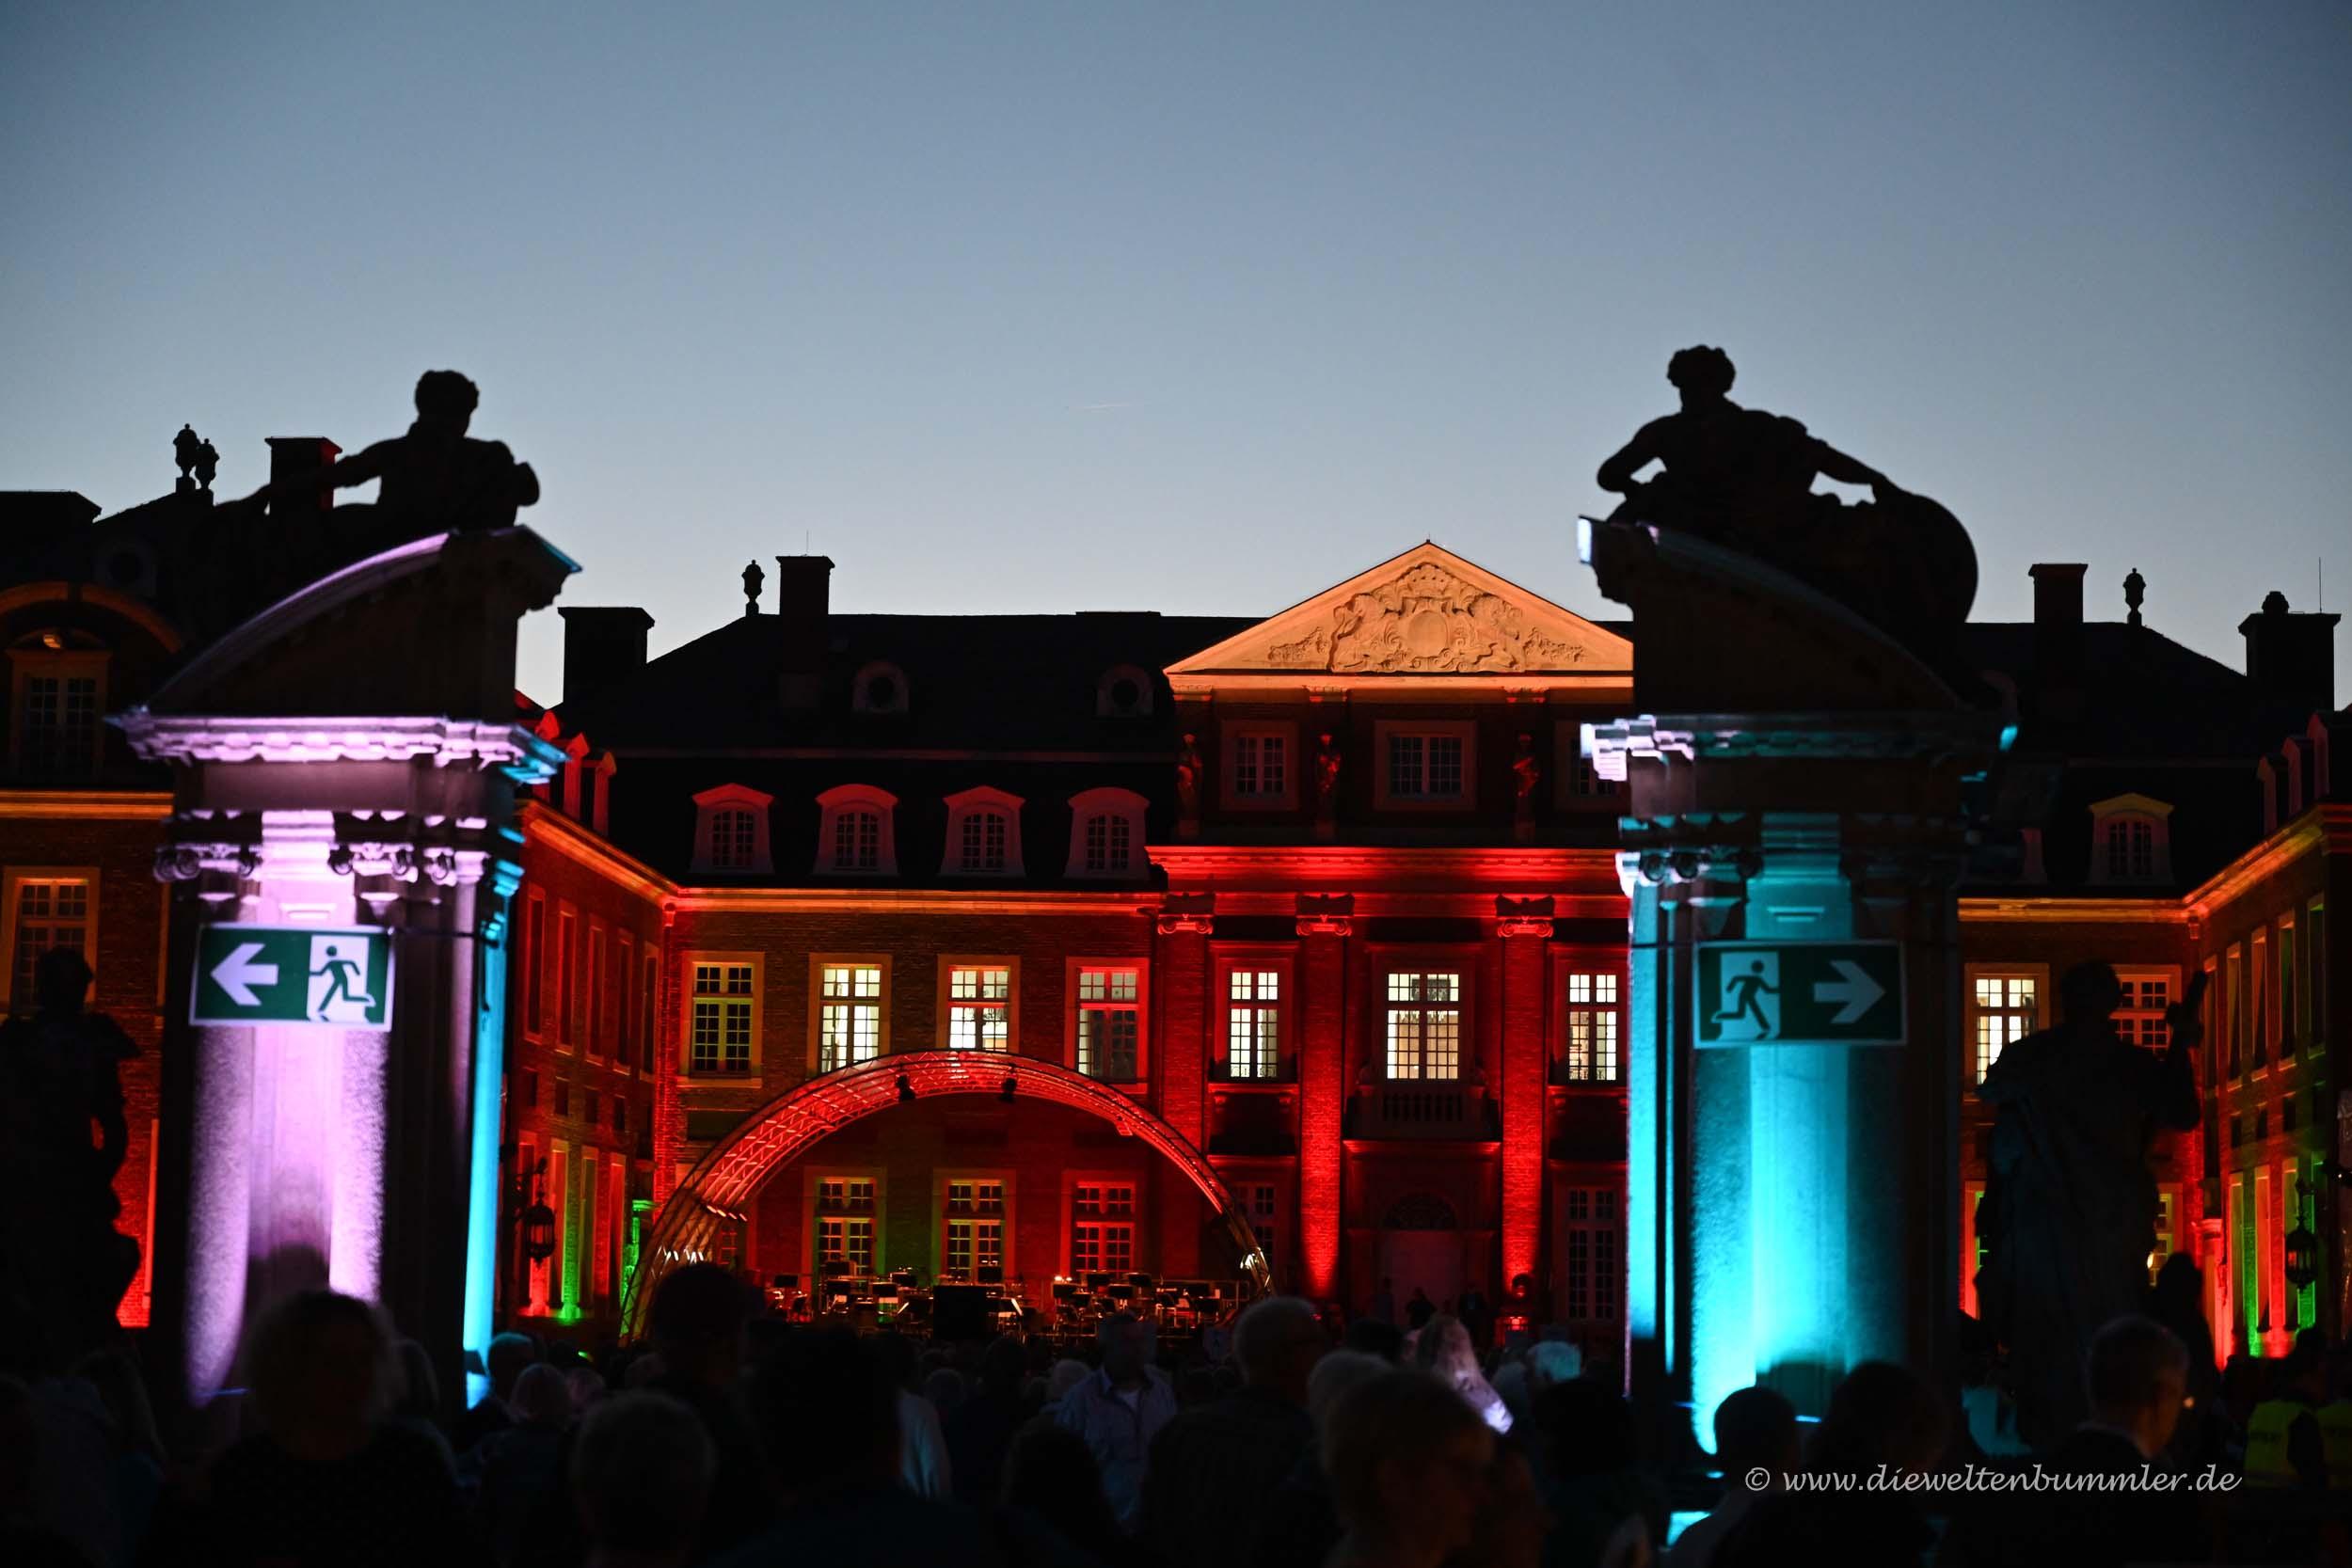 Zugang zum Schlosshof